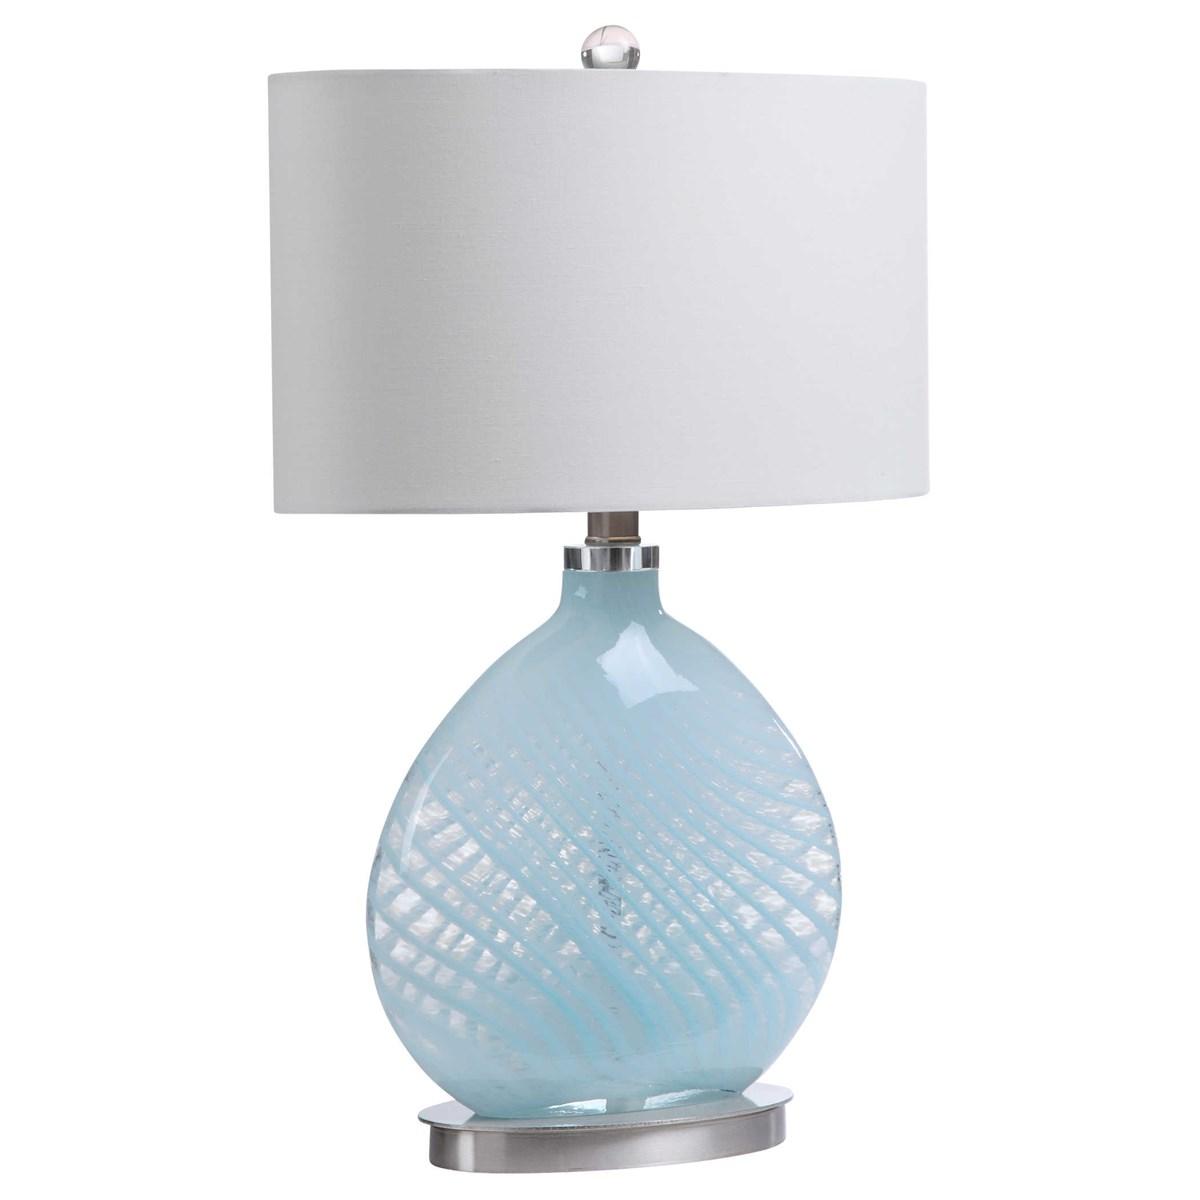 Lt. Blue Glass Table Lamp-$240.00